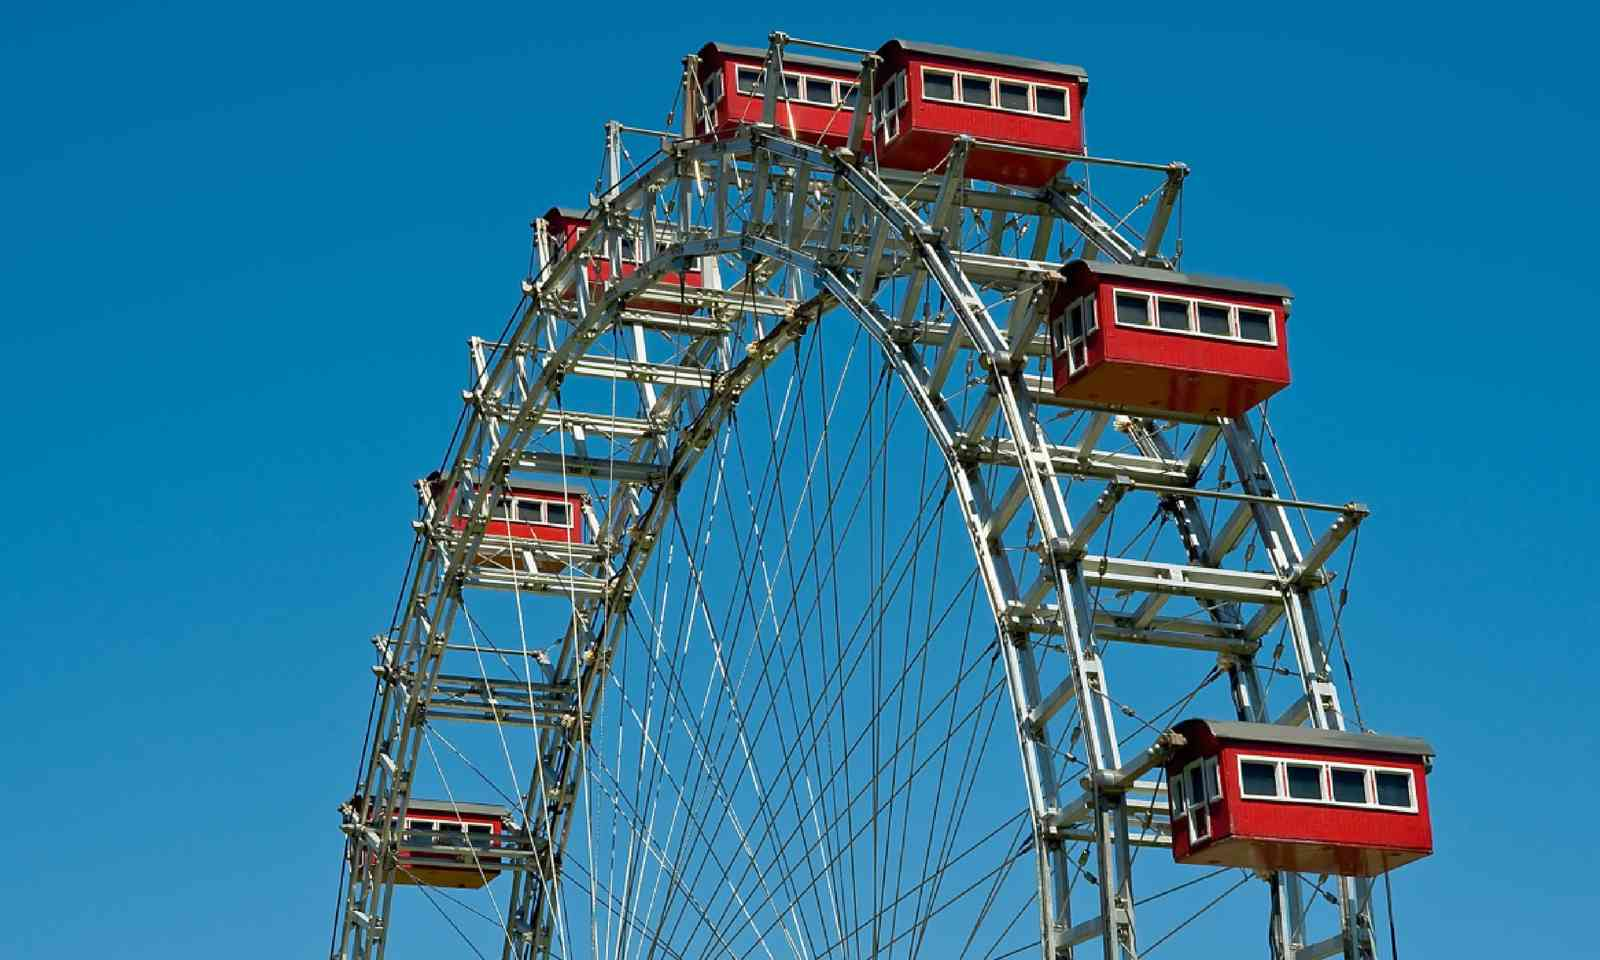 The ferris wheel of Prater, Vienna (Dreamstime)